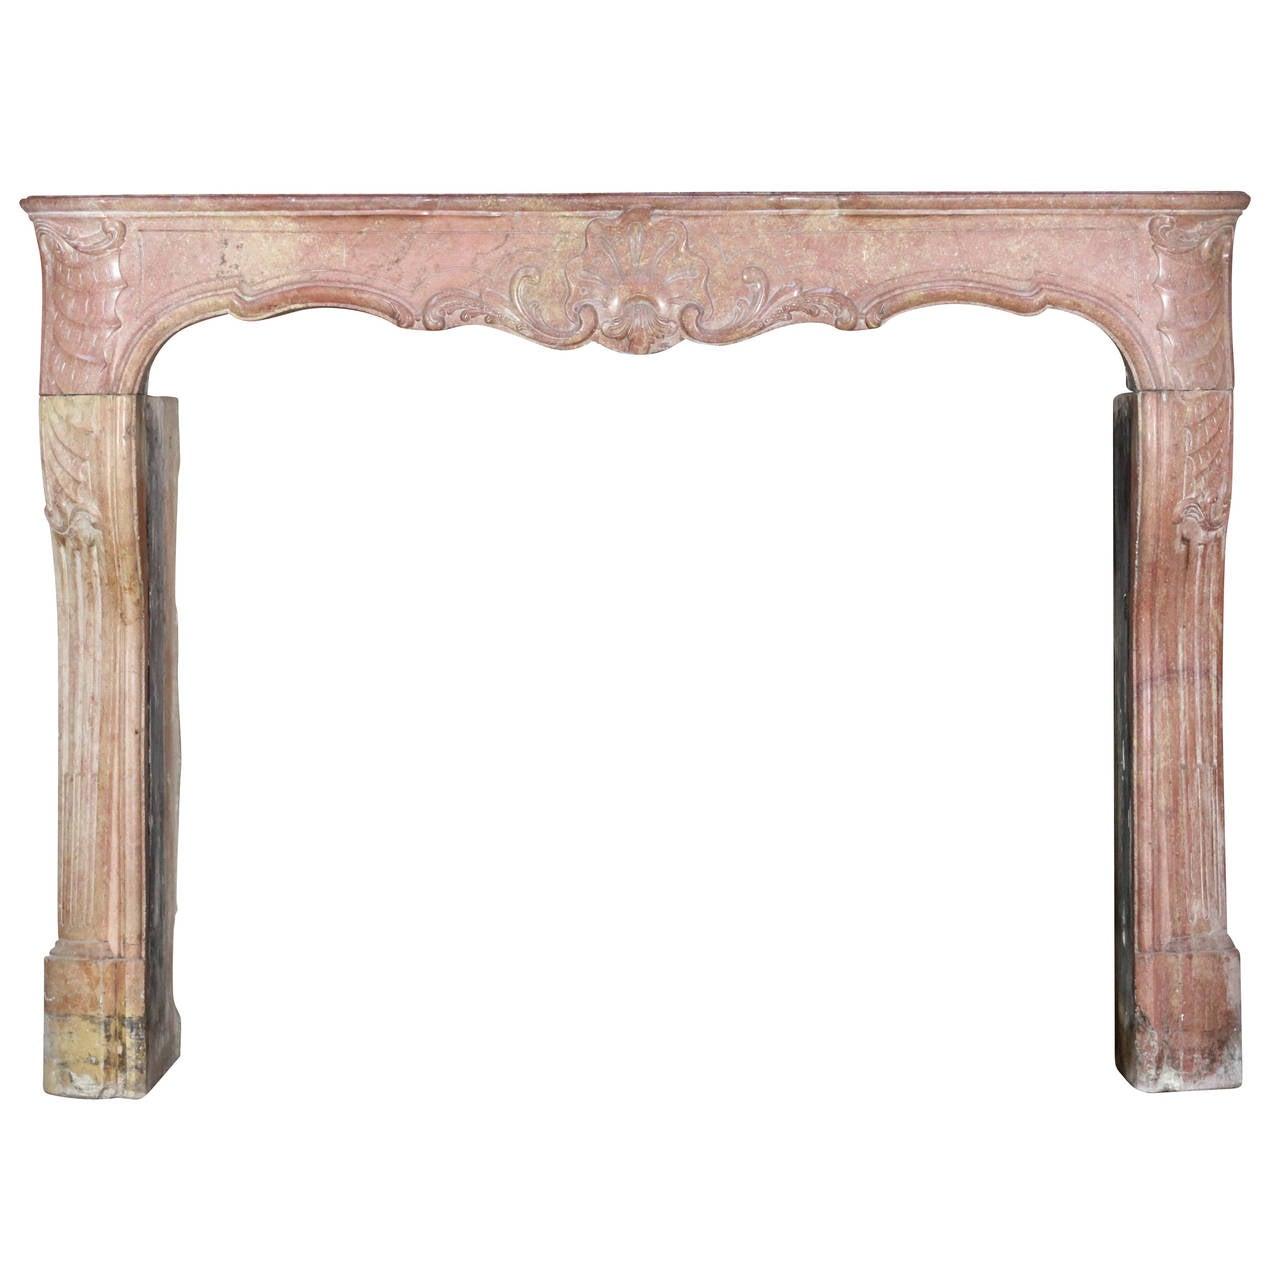 18th Century Impressive Burgundy Hard Stone antique Fireplace Mantel